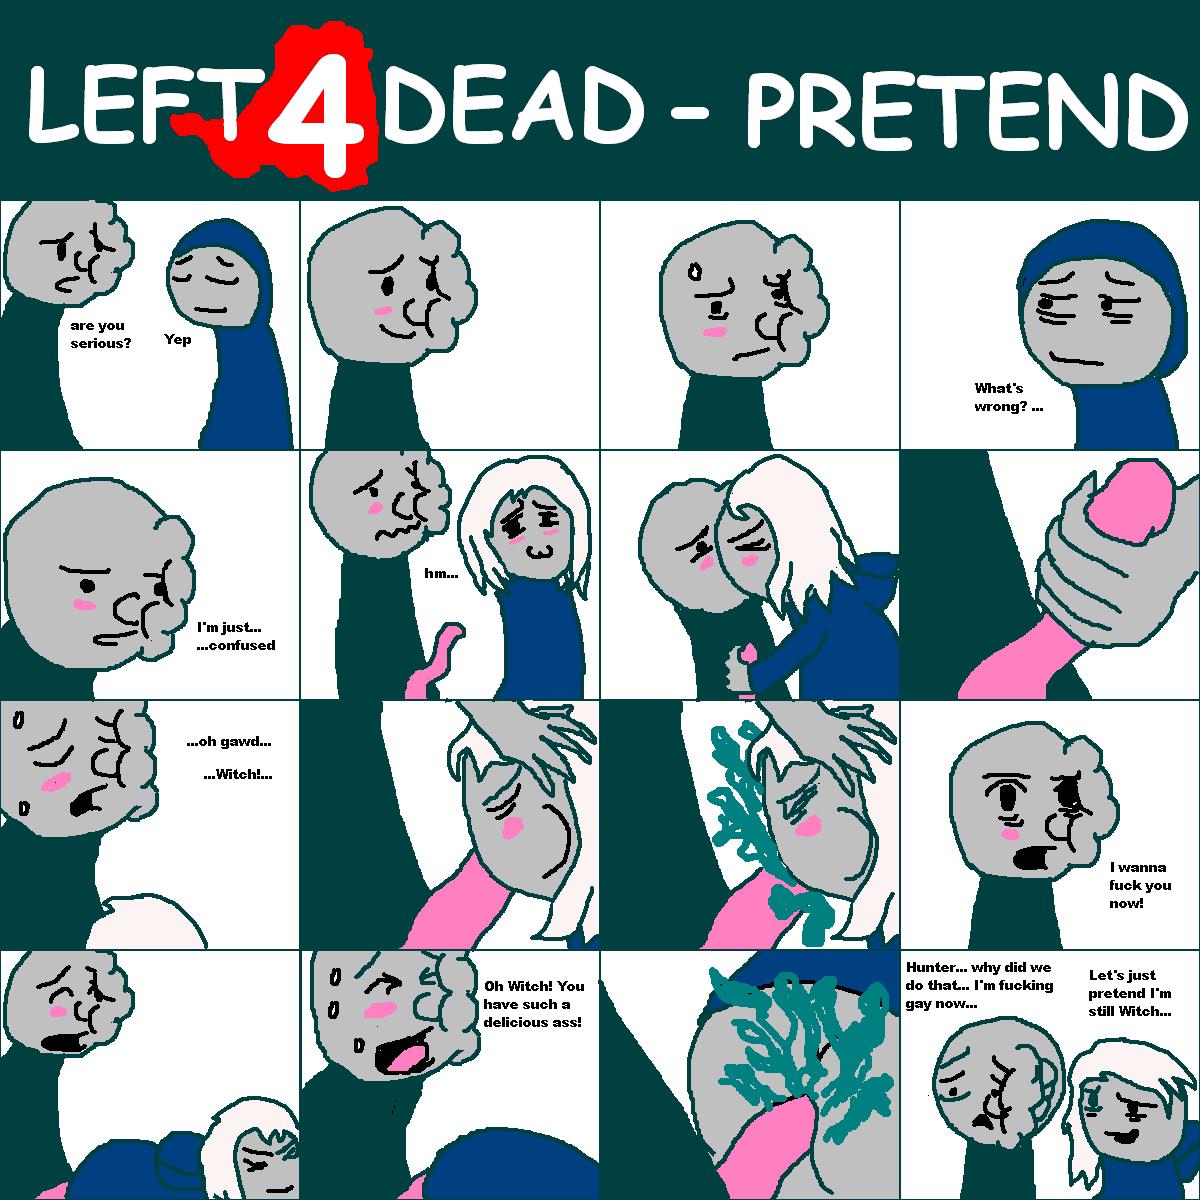 dead 4 spitter left 2 Yu-gi-oh tea hentai